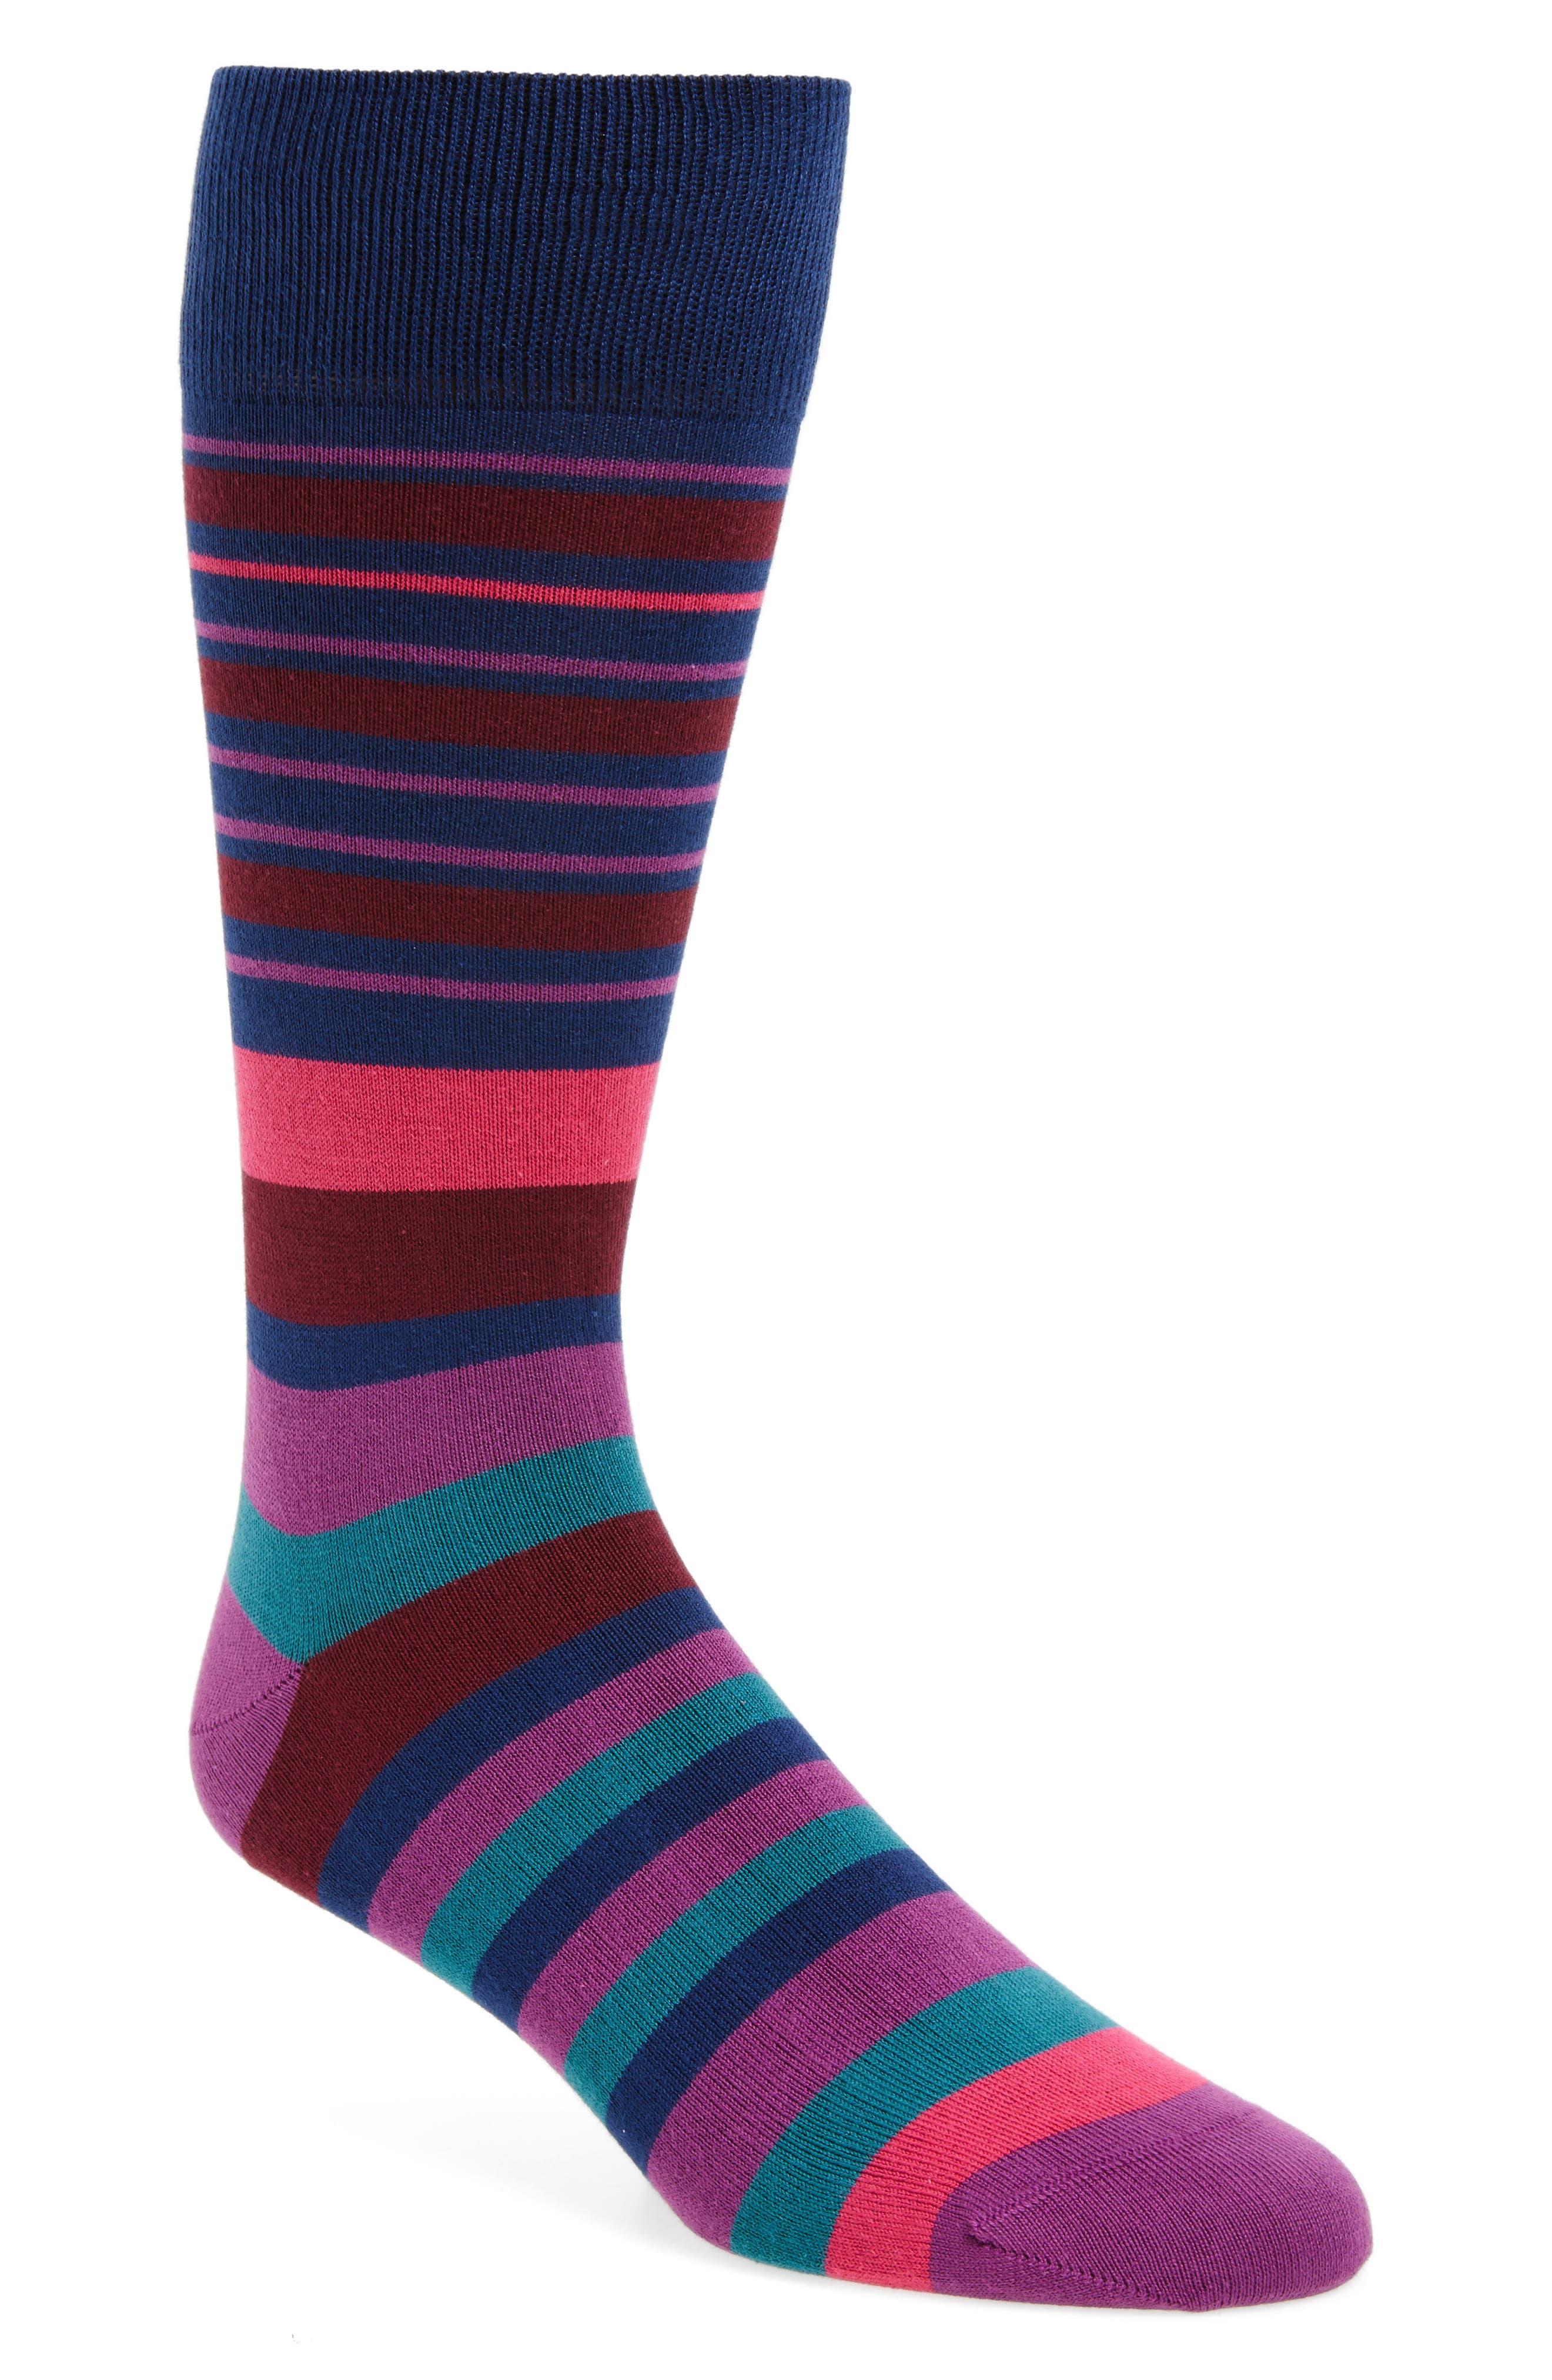 Alternate Image 1 Selected - Paul Smith Fern Stripe Socks